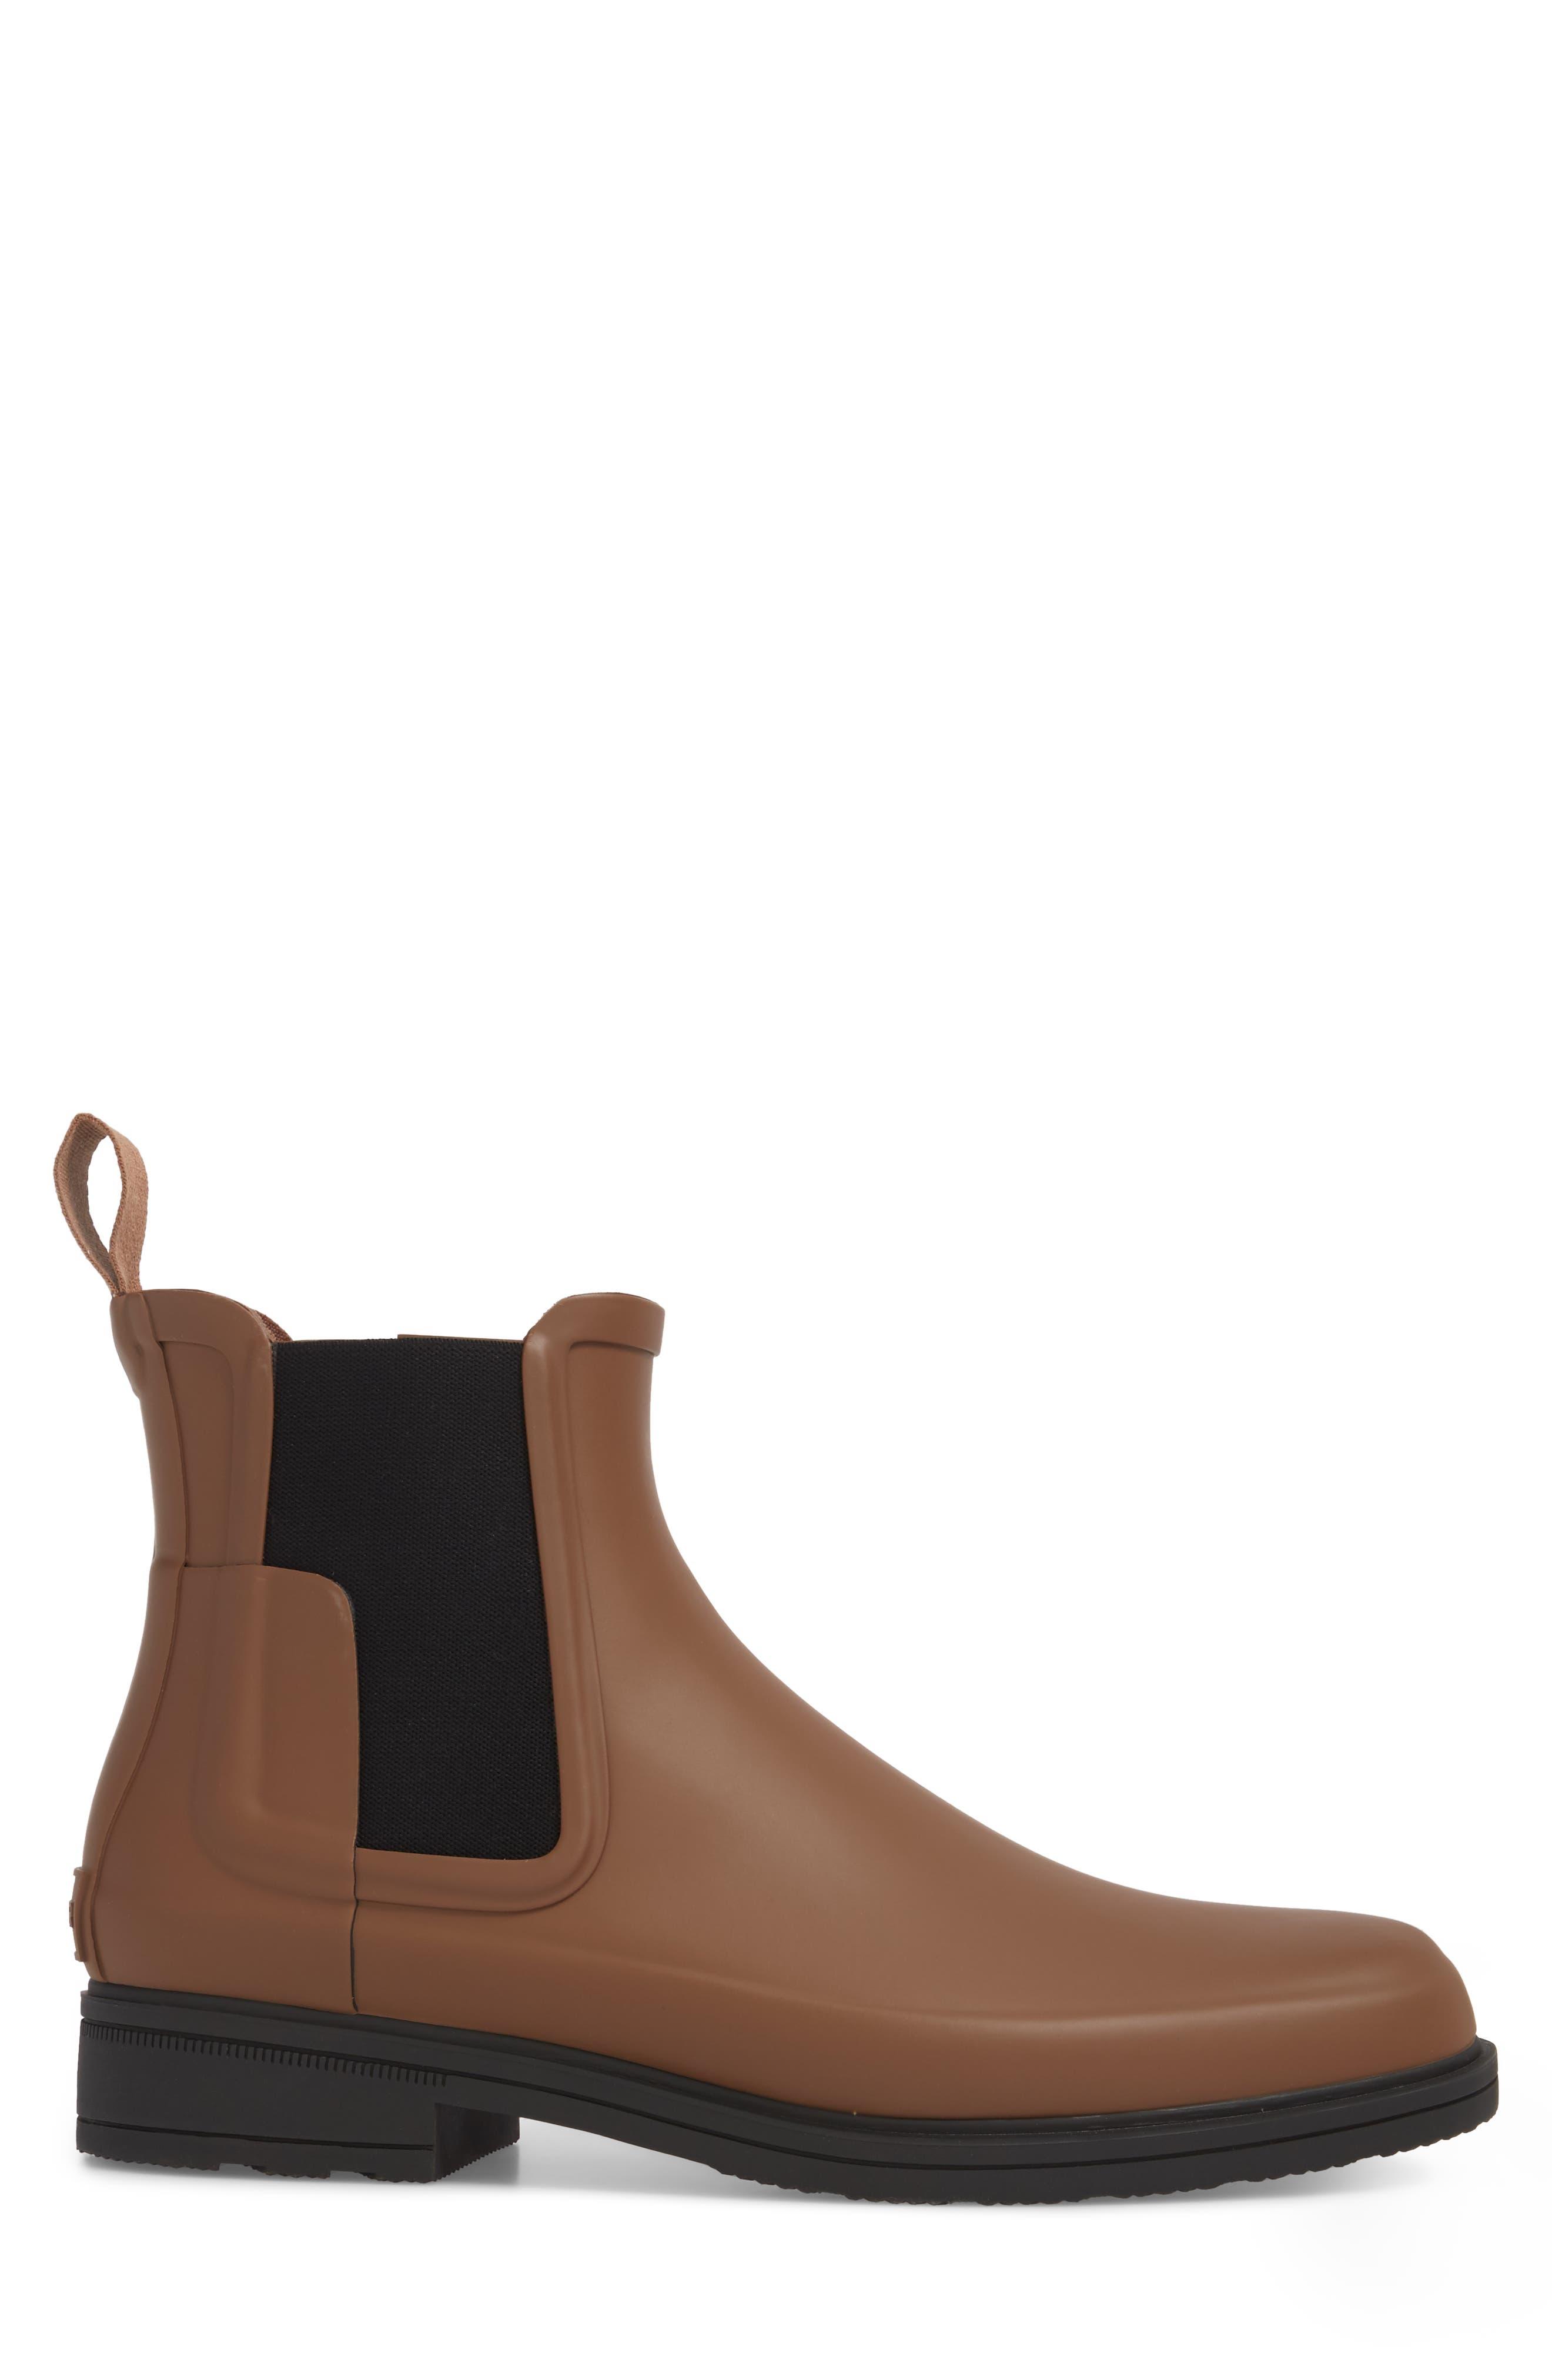 Original Refined Waterproof Chelsea Boot,                             Alternate thumbnail 3, color,                             Soil/ Black